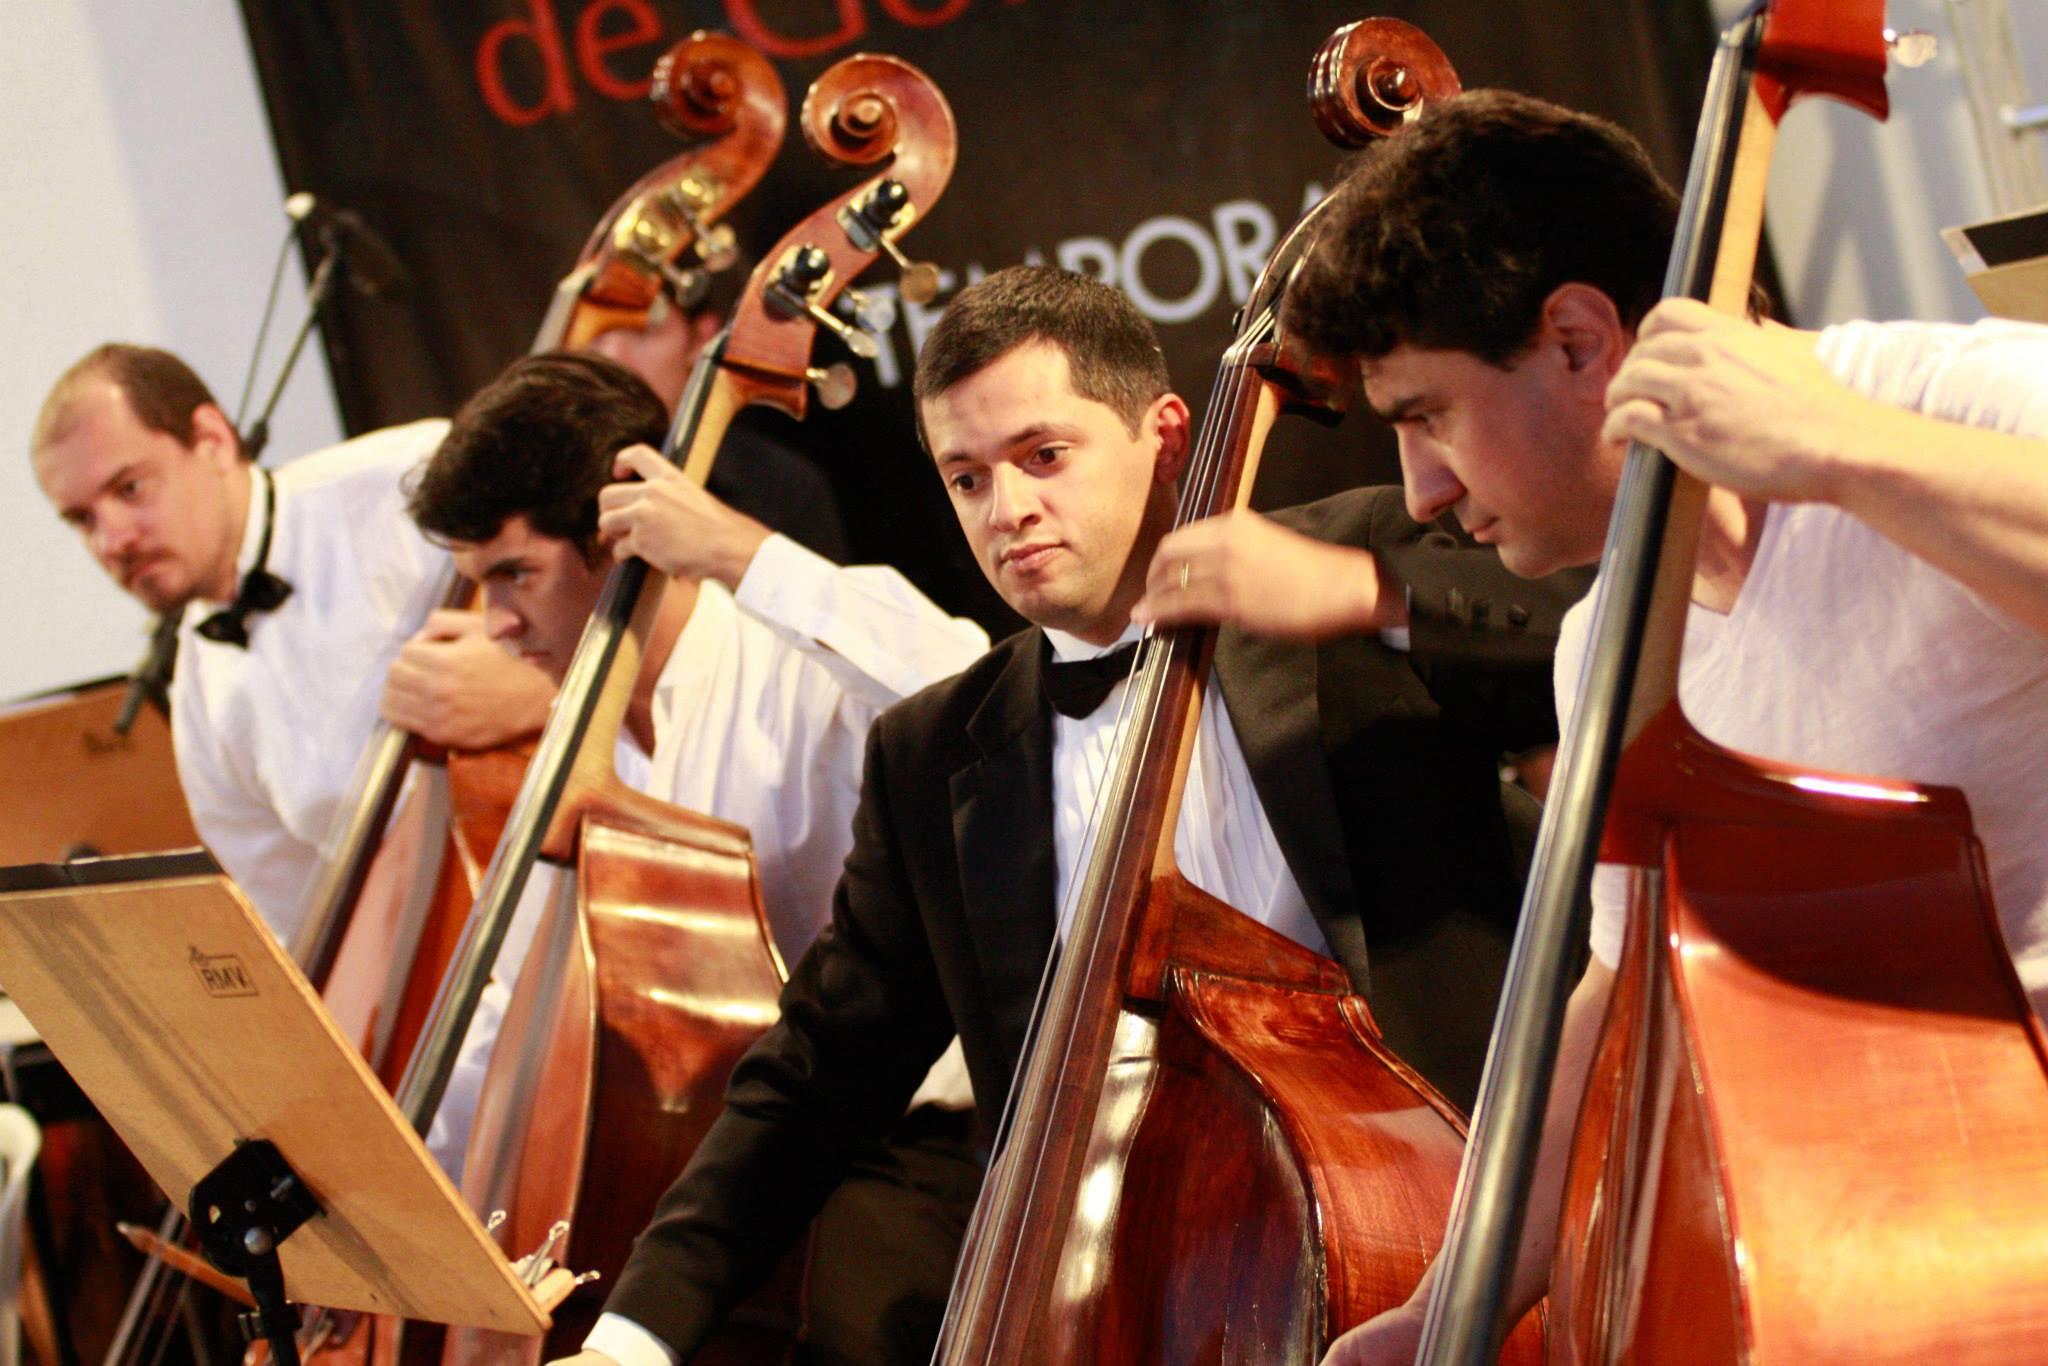 Orquestra Filarmônica de Goiás apresenta especial de natal